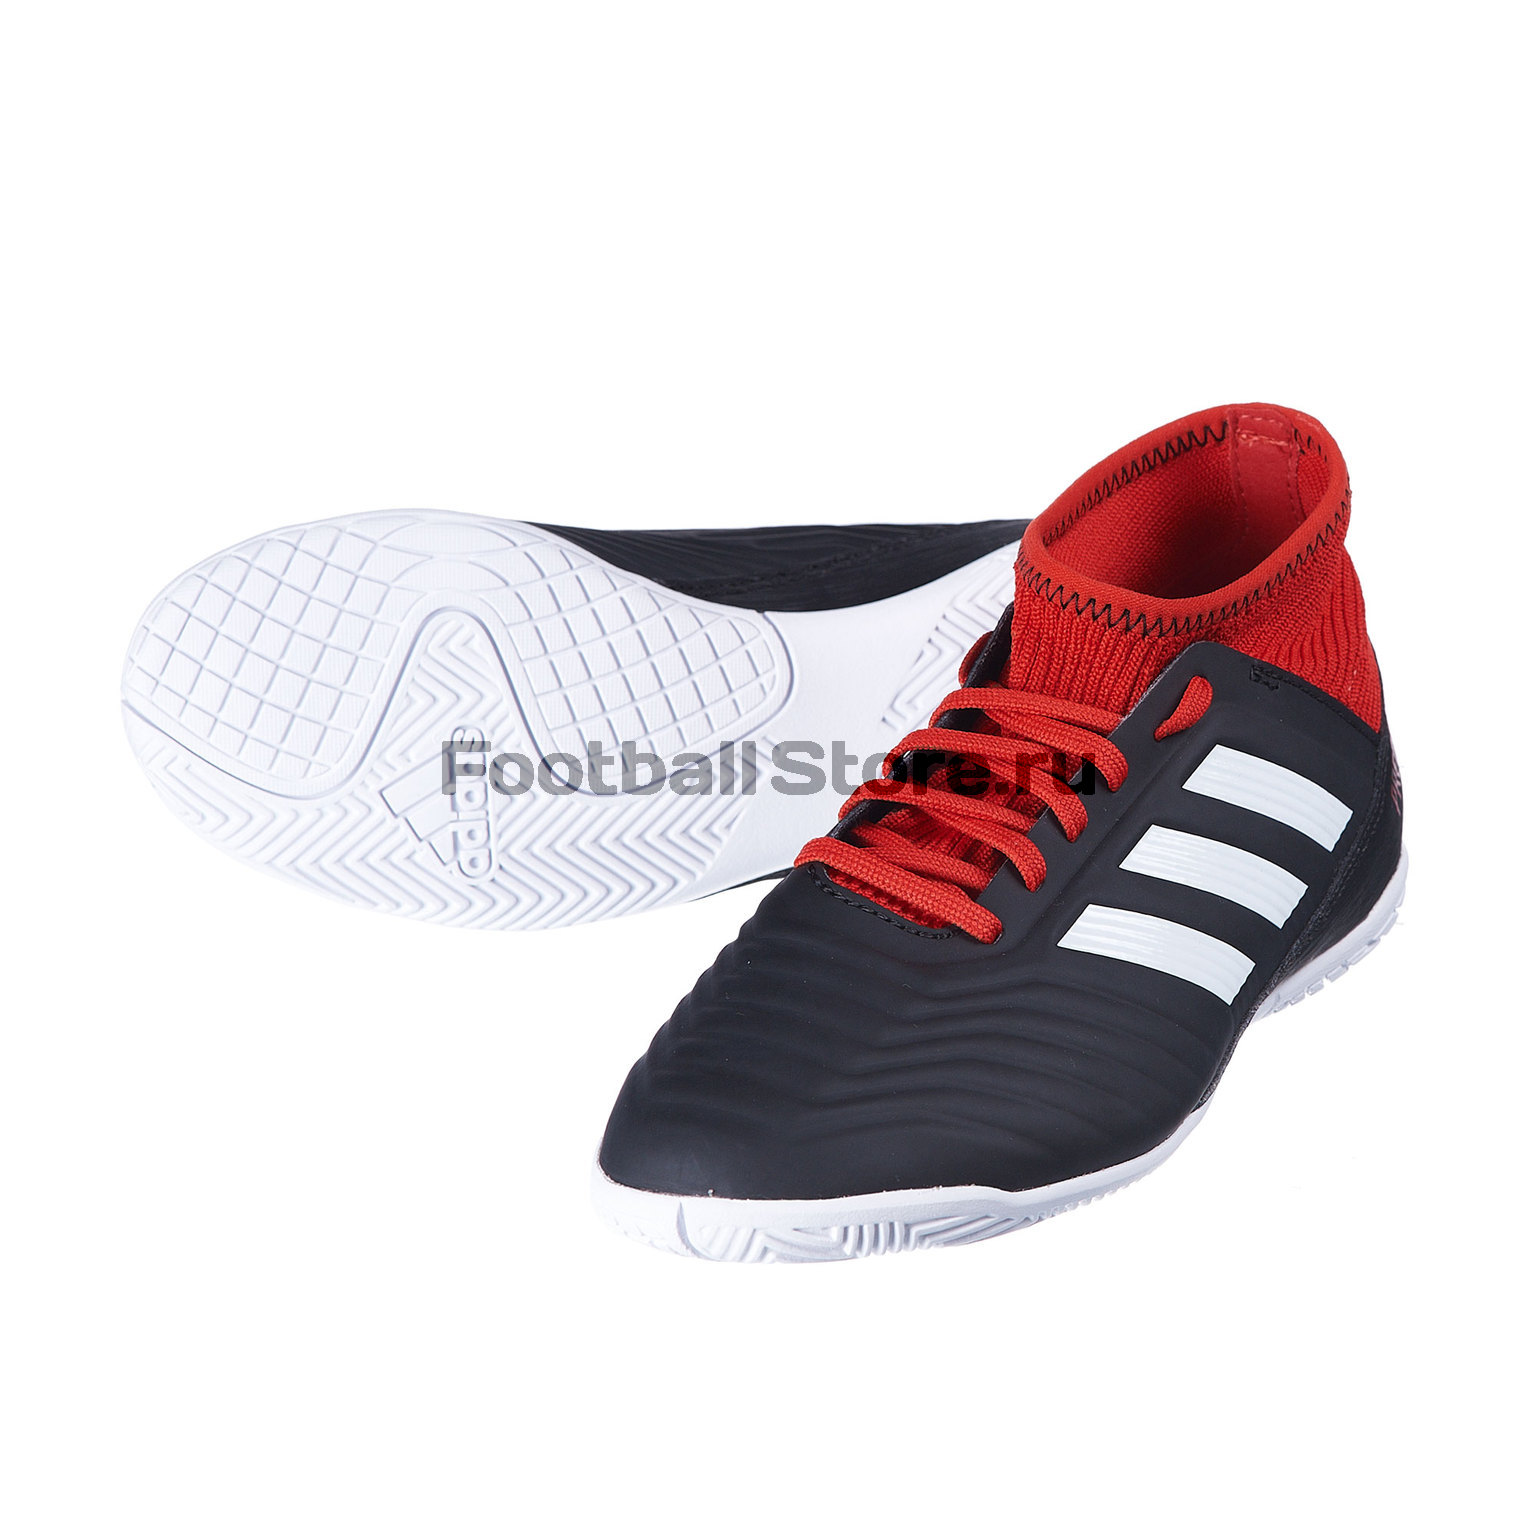 Футзалки детские Adidas Predator Tango 18.3 IN DB2324 цена